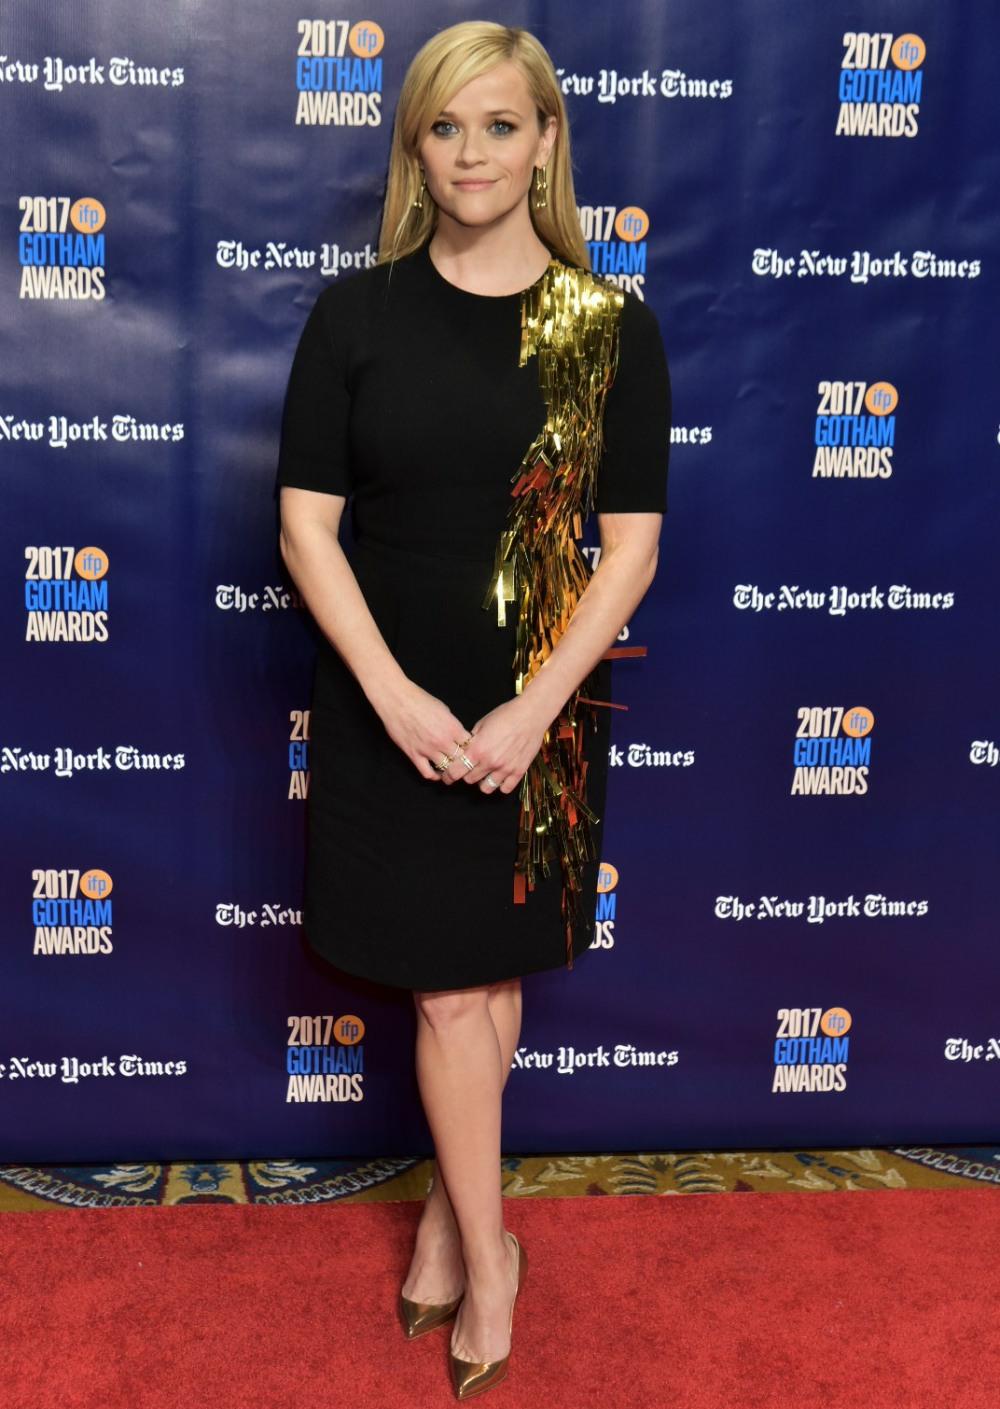 2017 Gotham Independent Film Awards